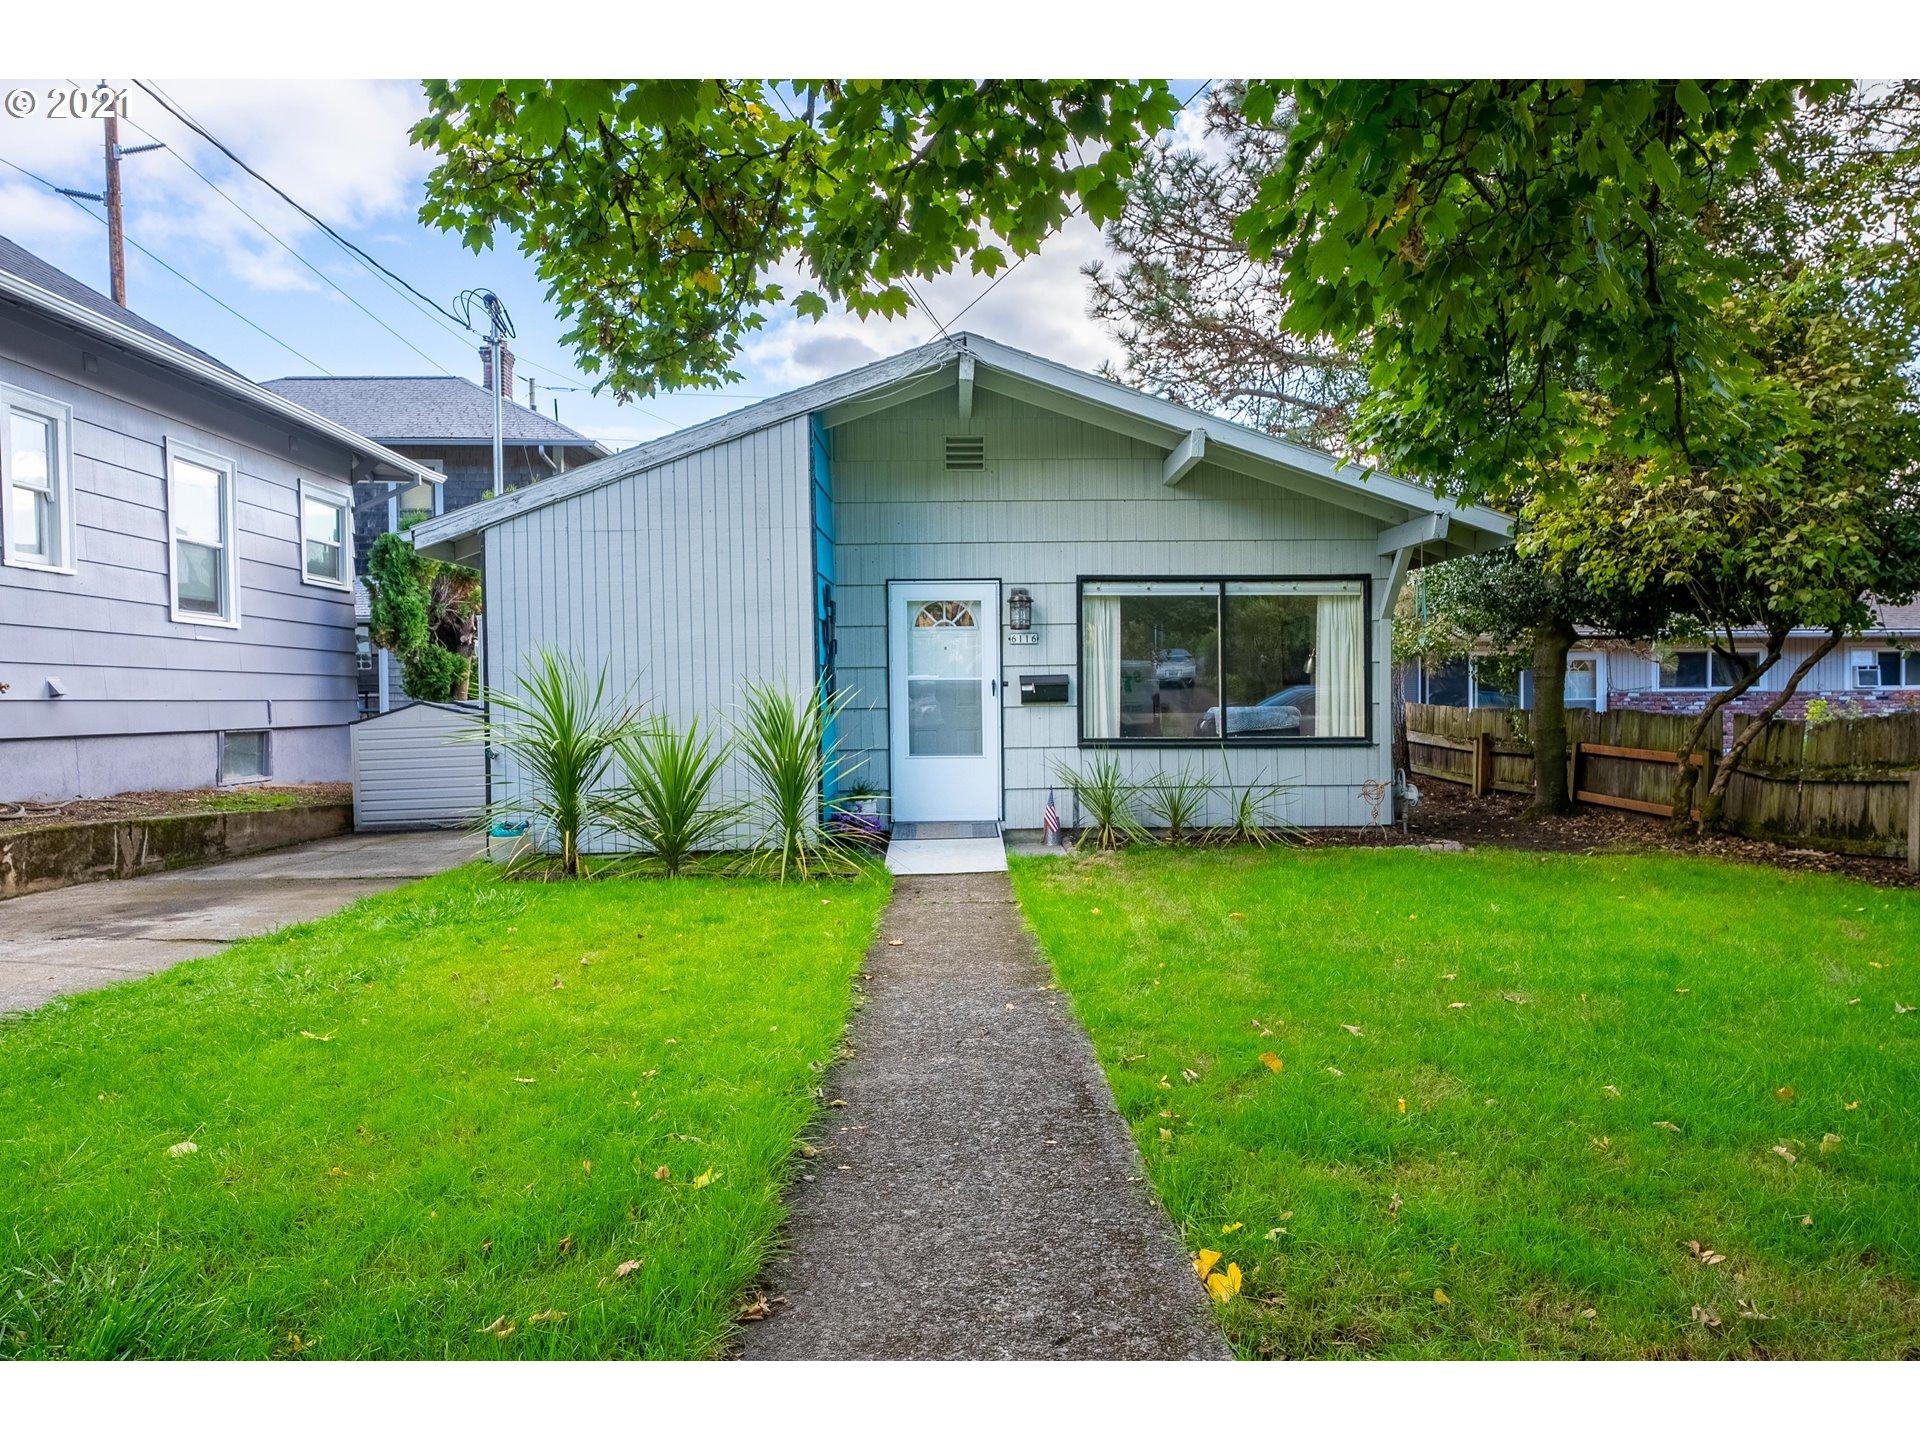 6116 S HOOD AVE, Portland OR 97239